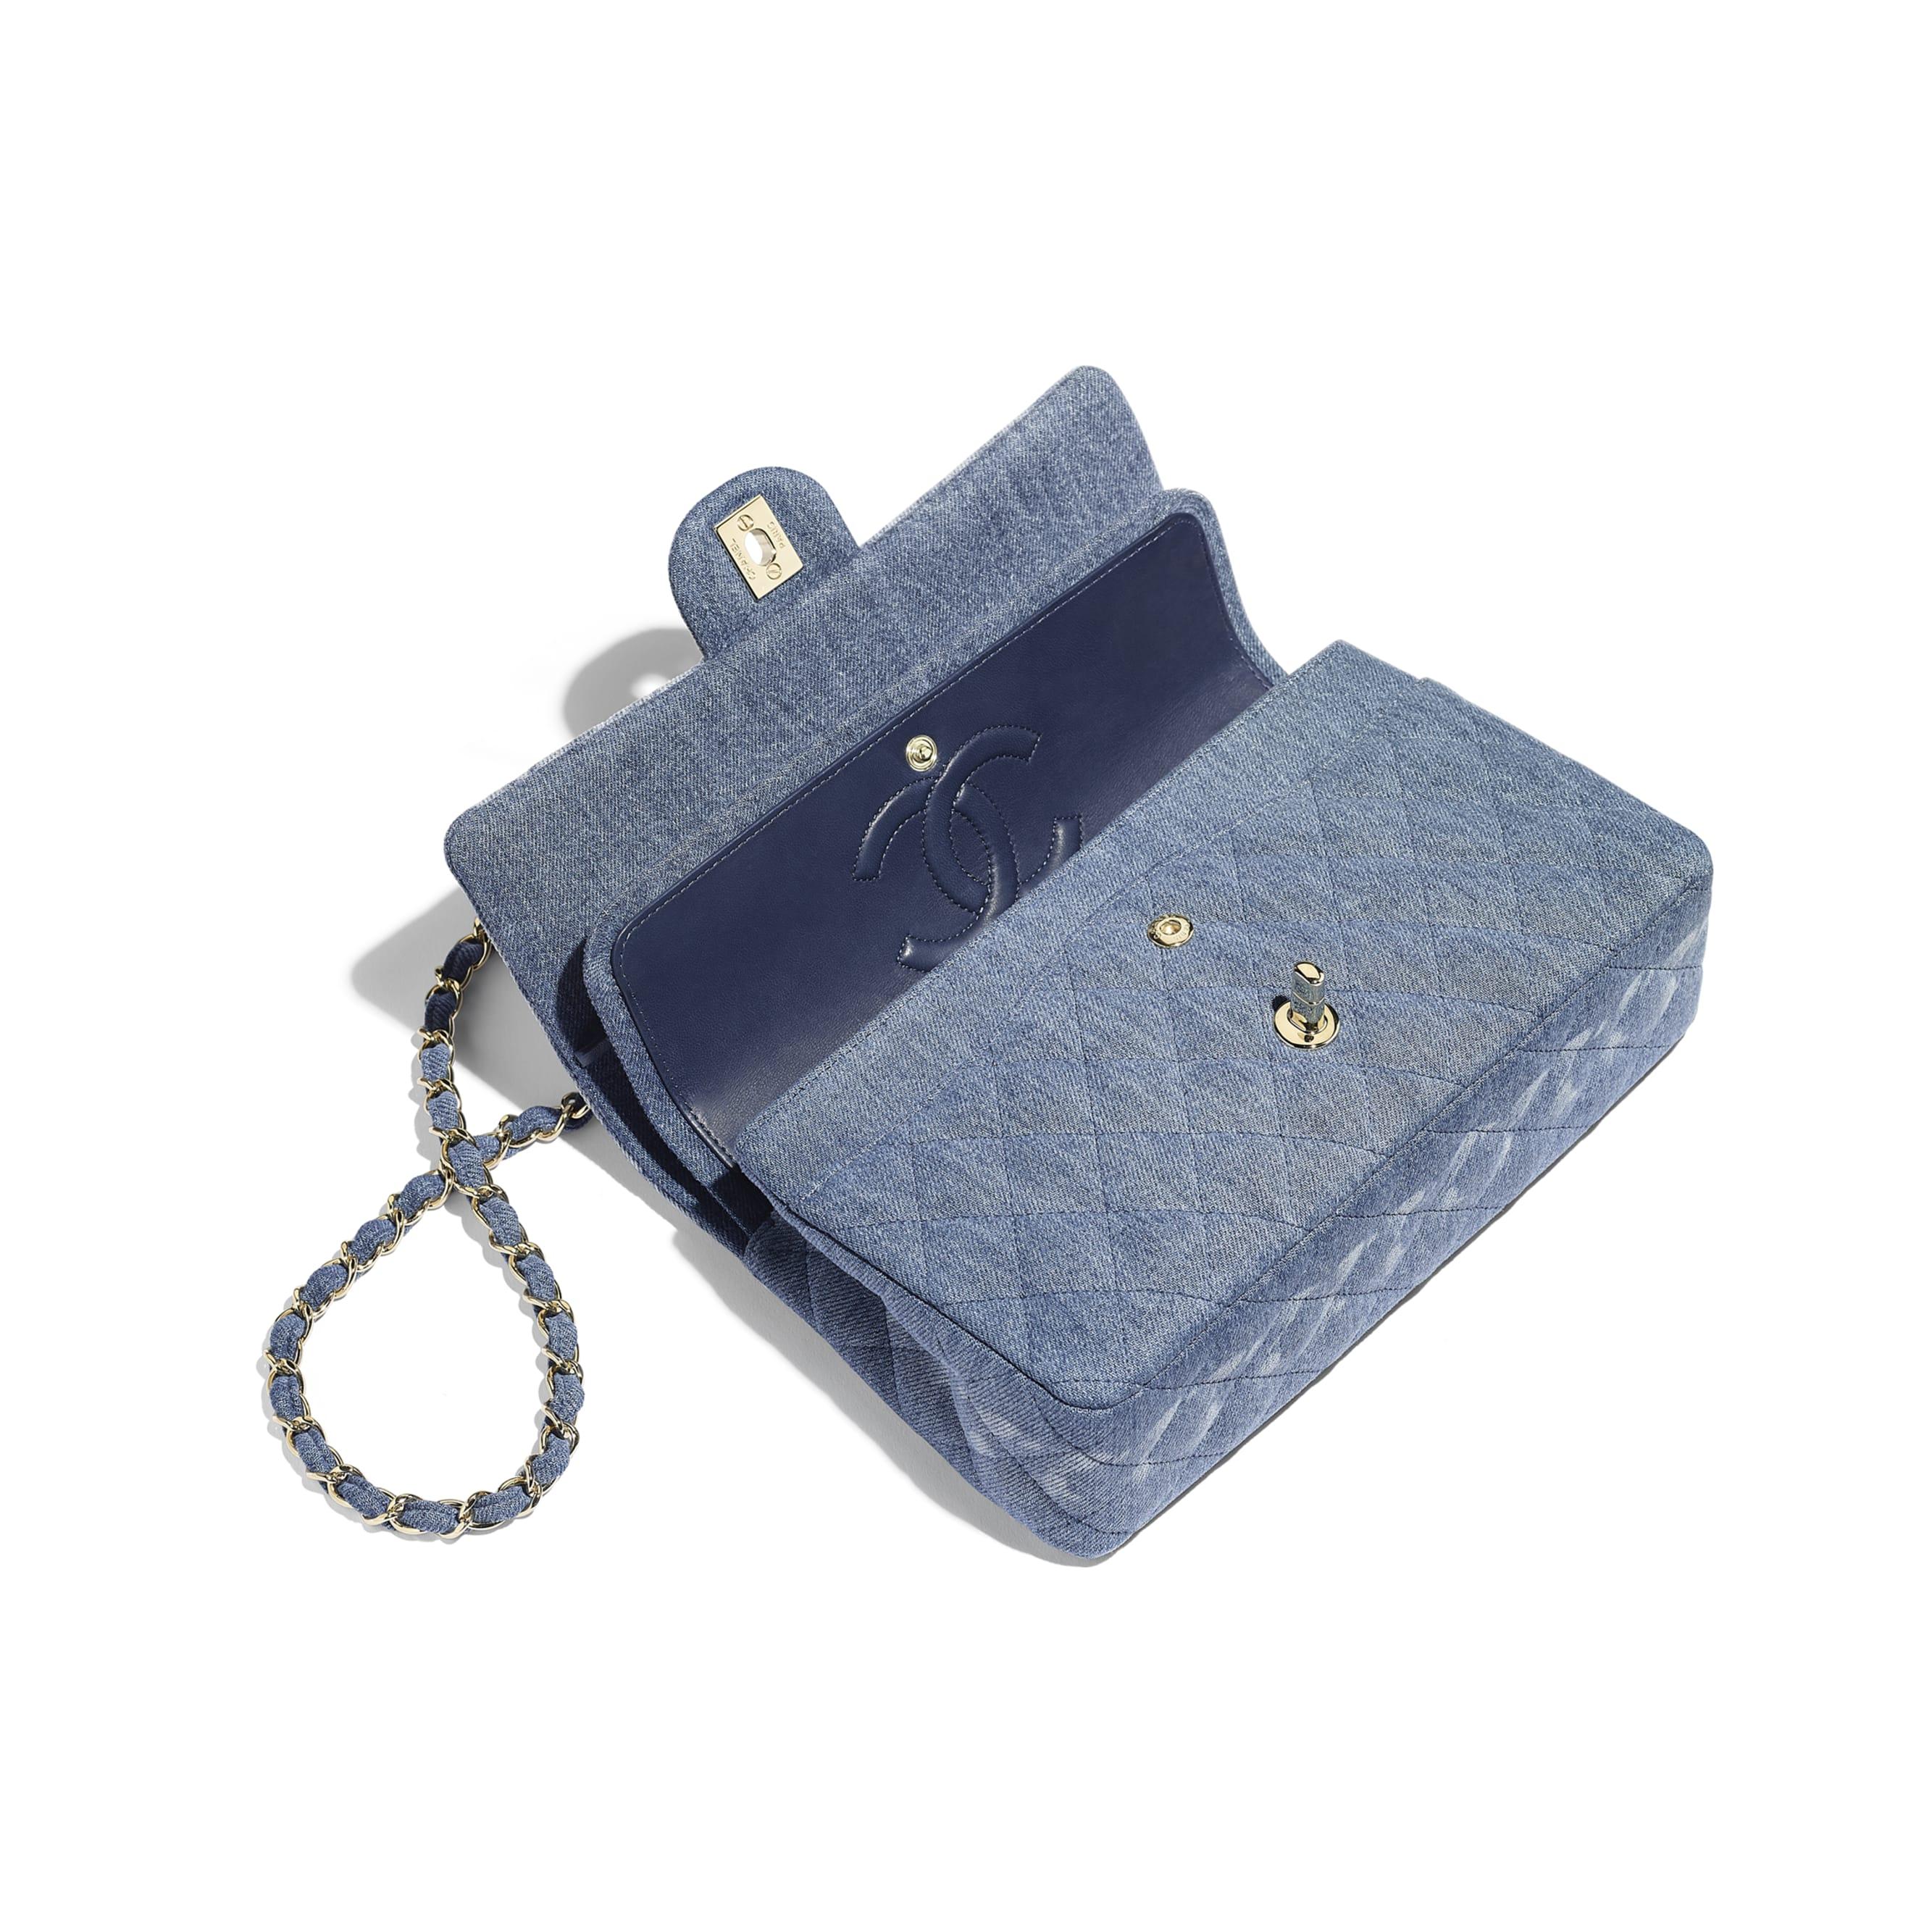 88c7621055ce ... Classic Handbag - Blue - Denim   Gold-Tone Metal - Other view - see